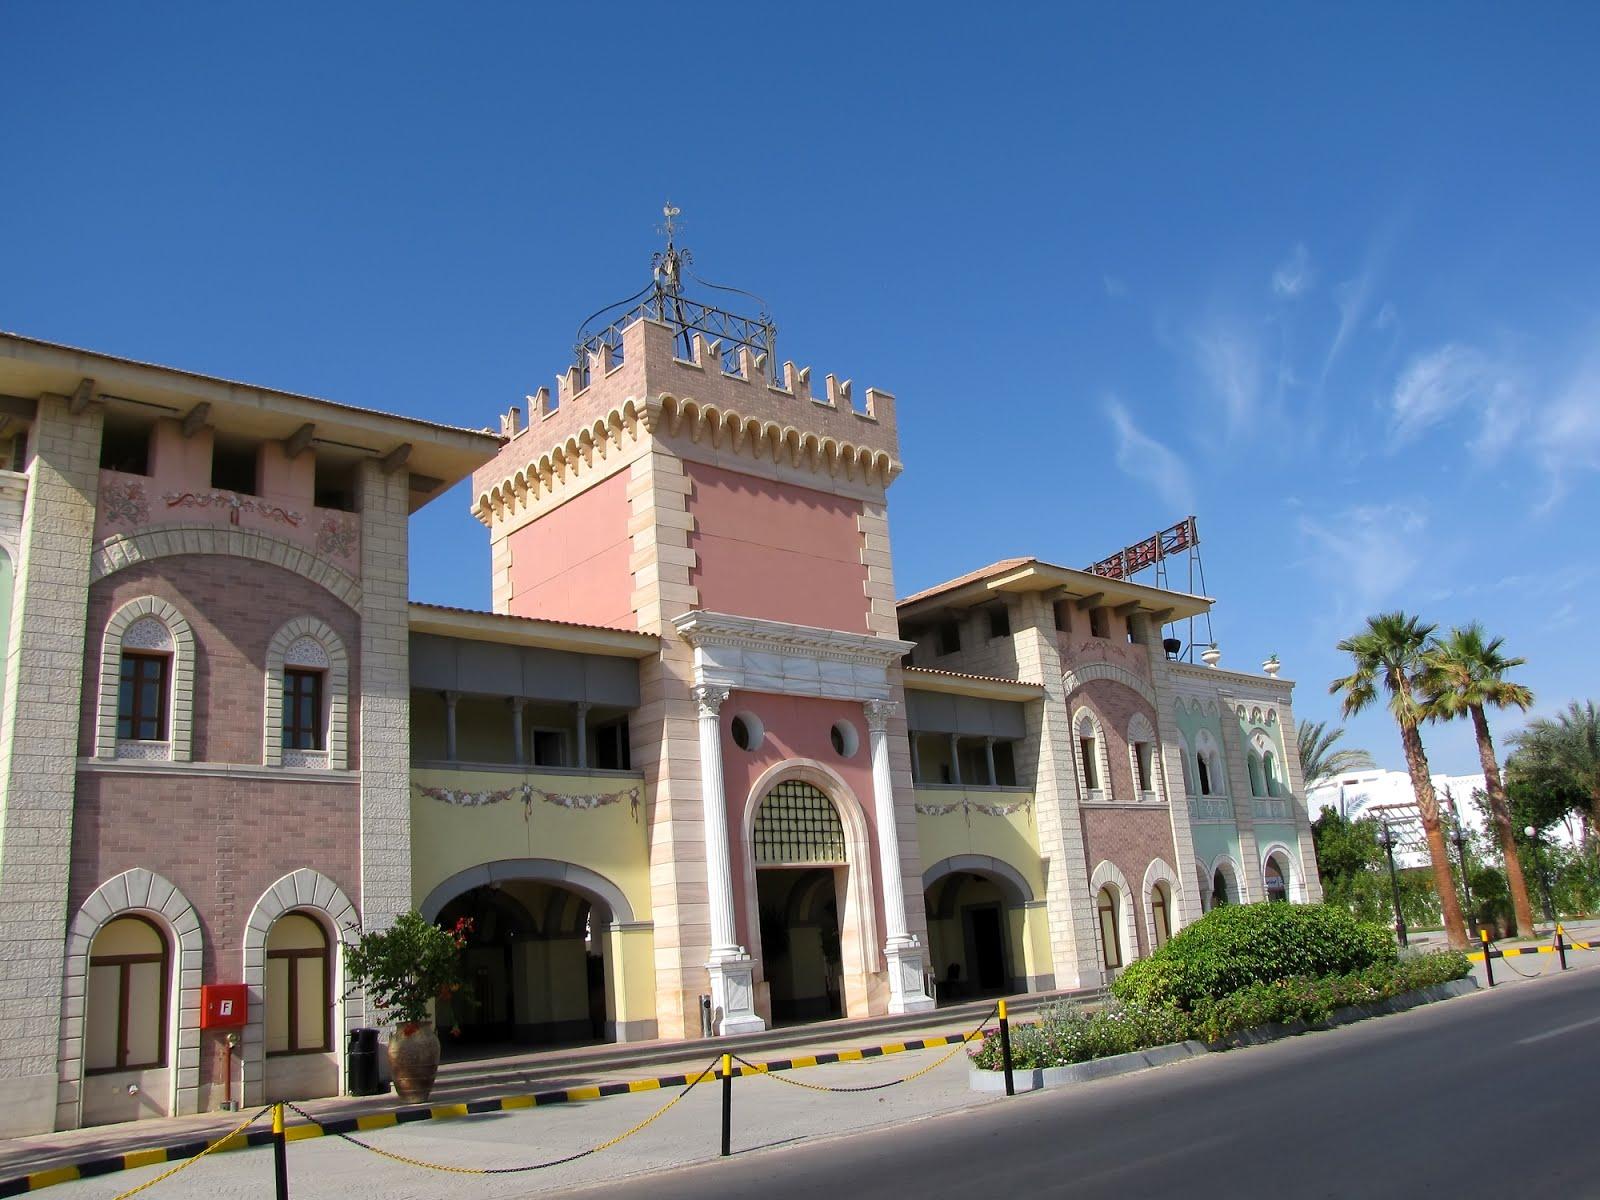 http://4.bp.blogspot.com/-RUWLA0C9zro/UJCYRU58mqI/AAAAAAABNdA/-768psUMp_8/s1600/hermoso-edificio-de-estilo-arabe-en-egipto-Beautiful%2Bbuilding%2Bin%2BArabic%2Bstyle.jpg